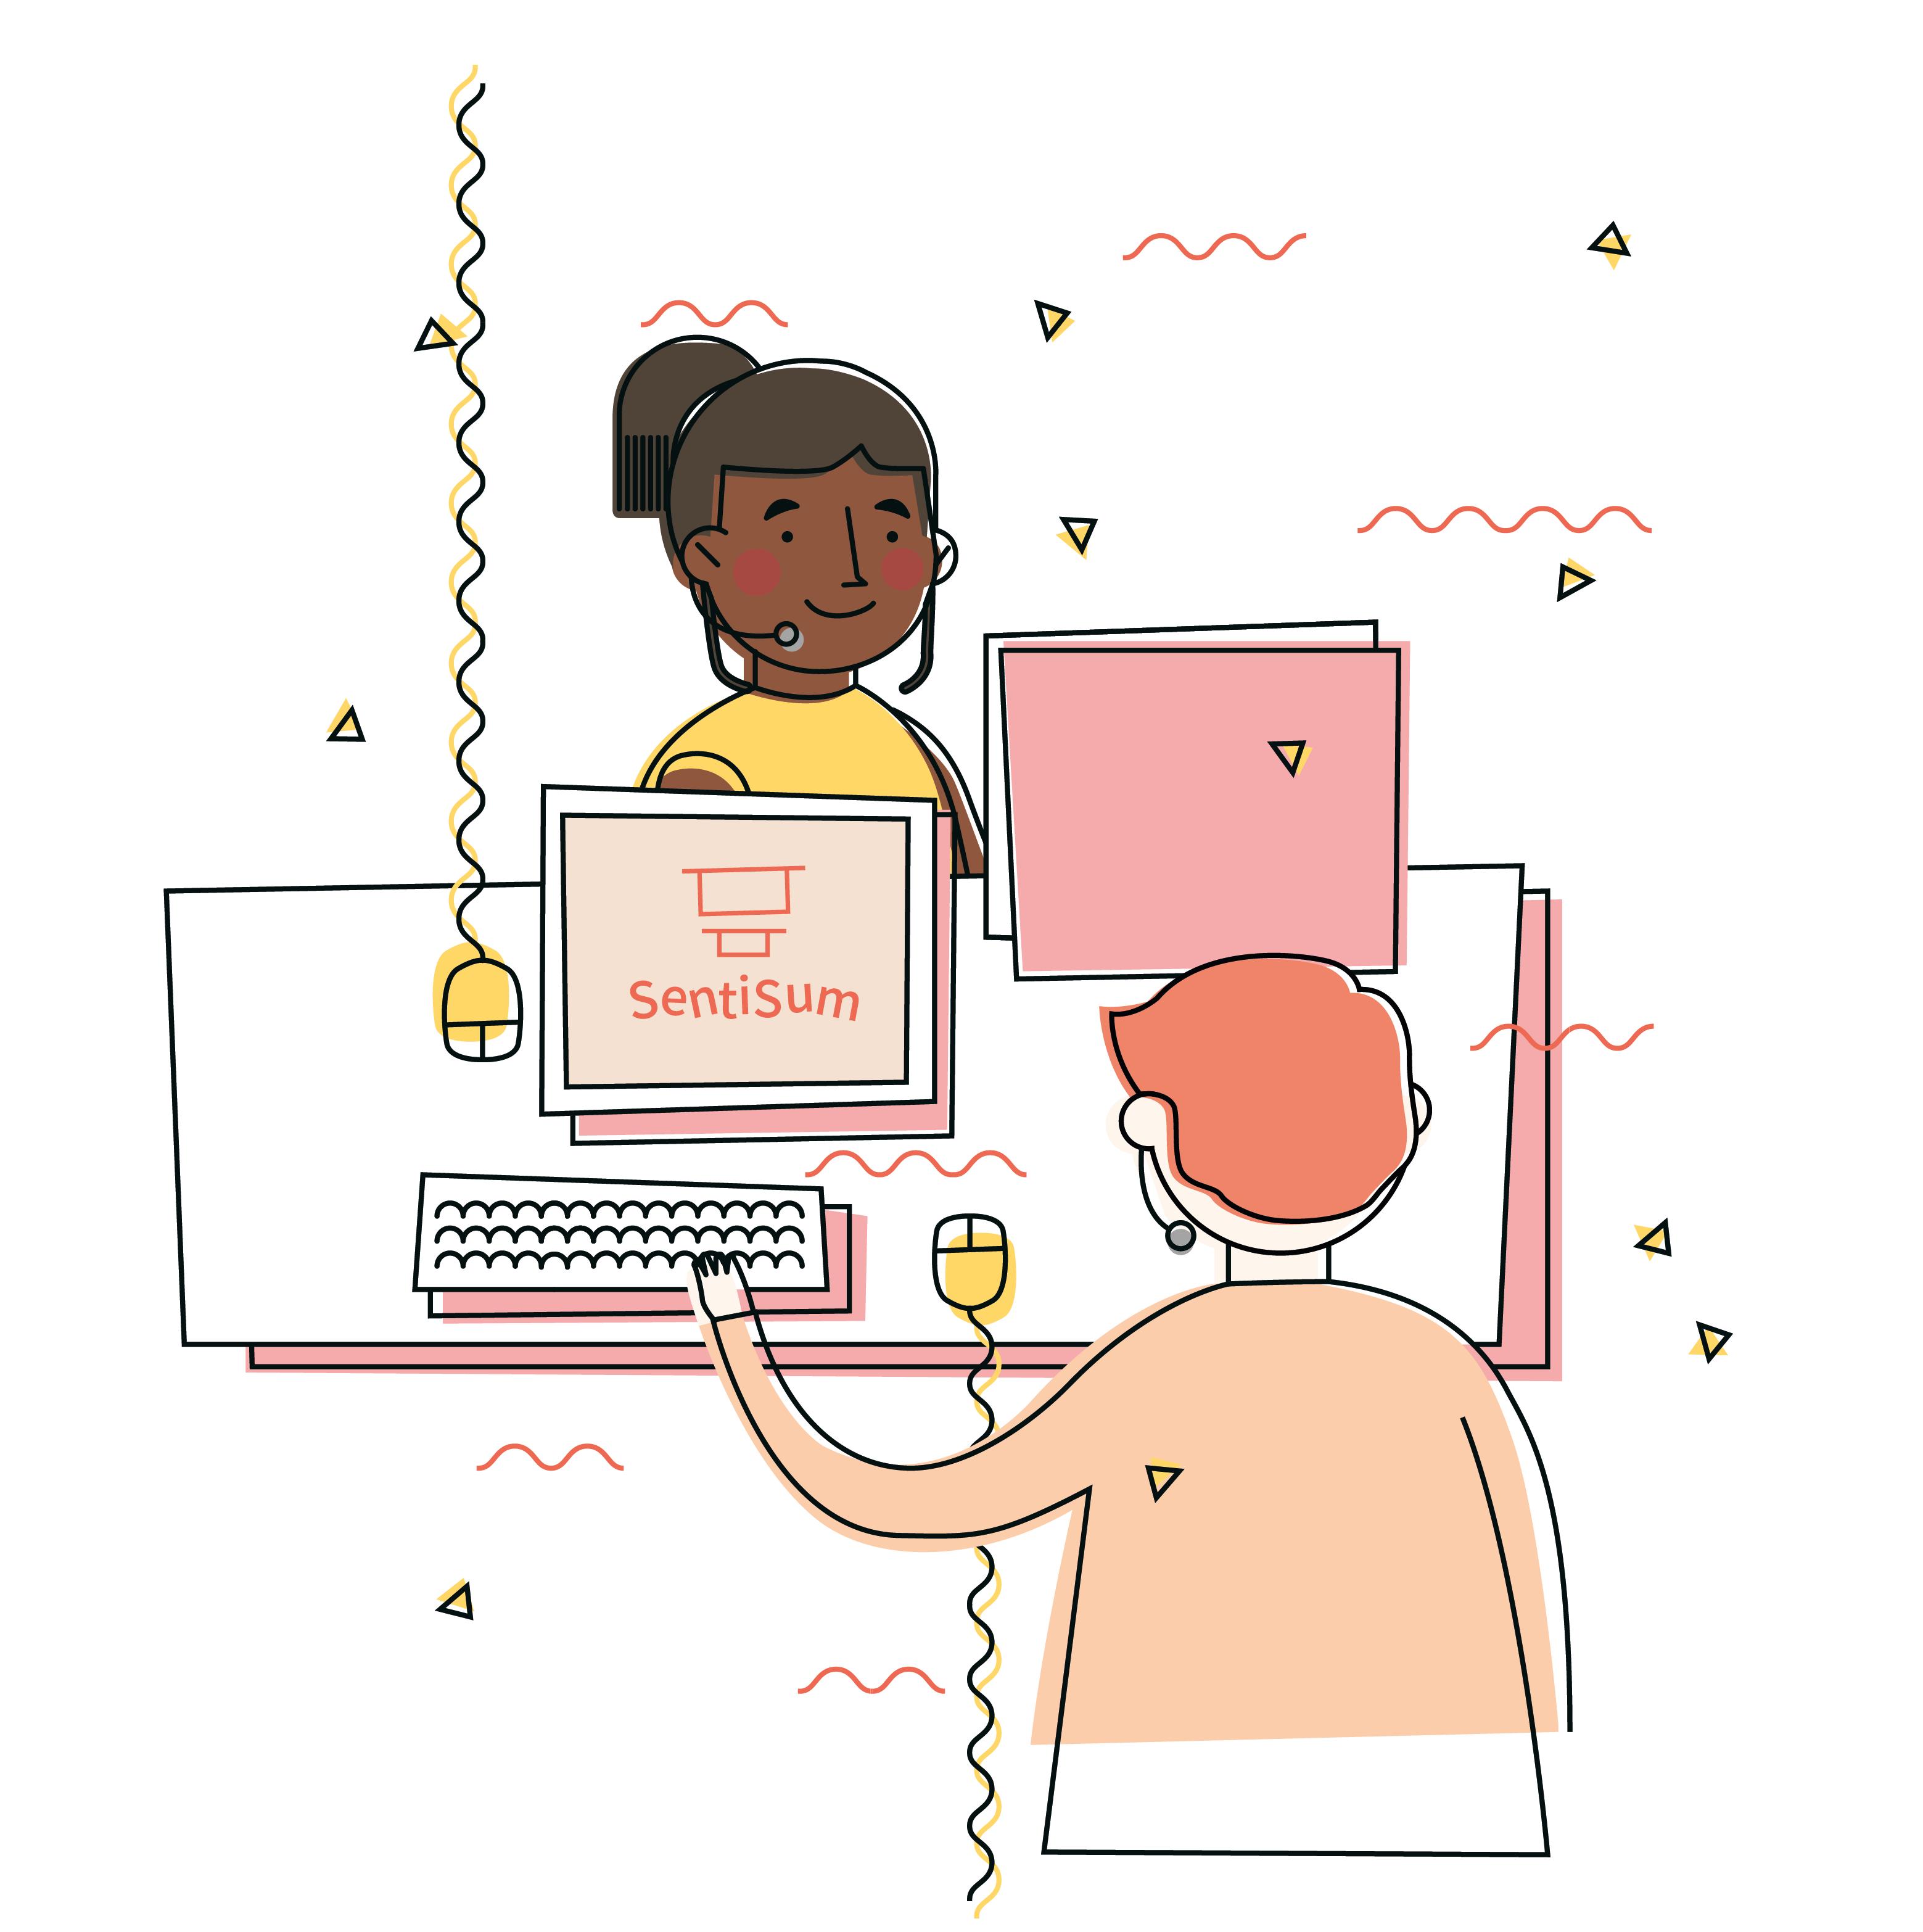 Cartoon customer service image